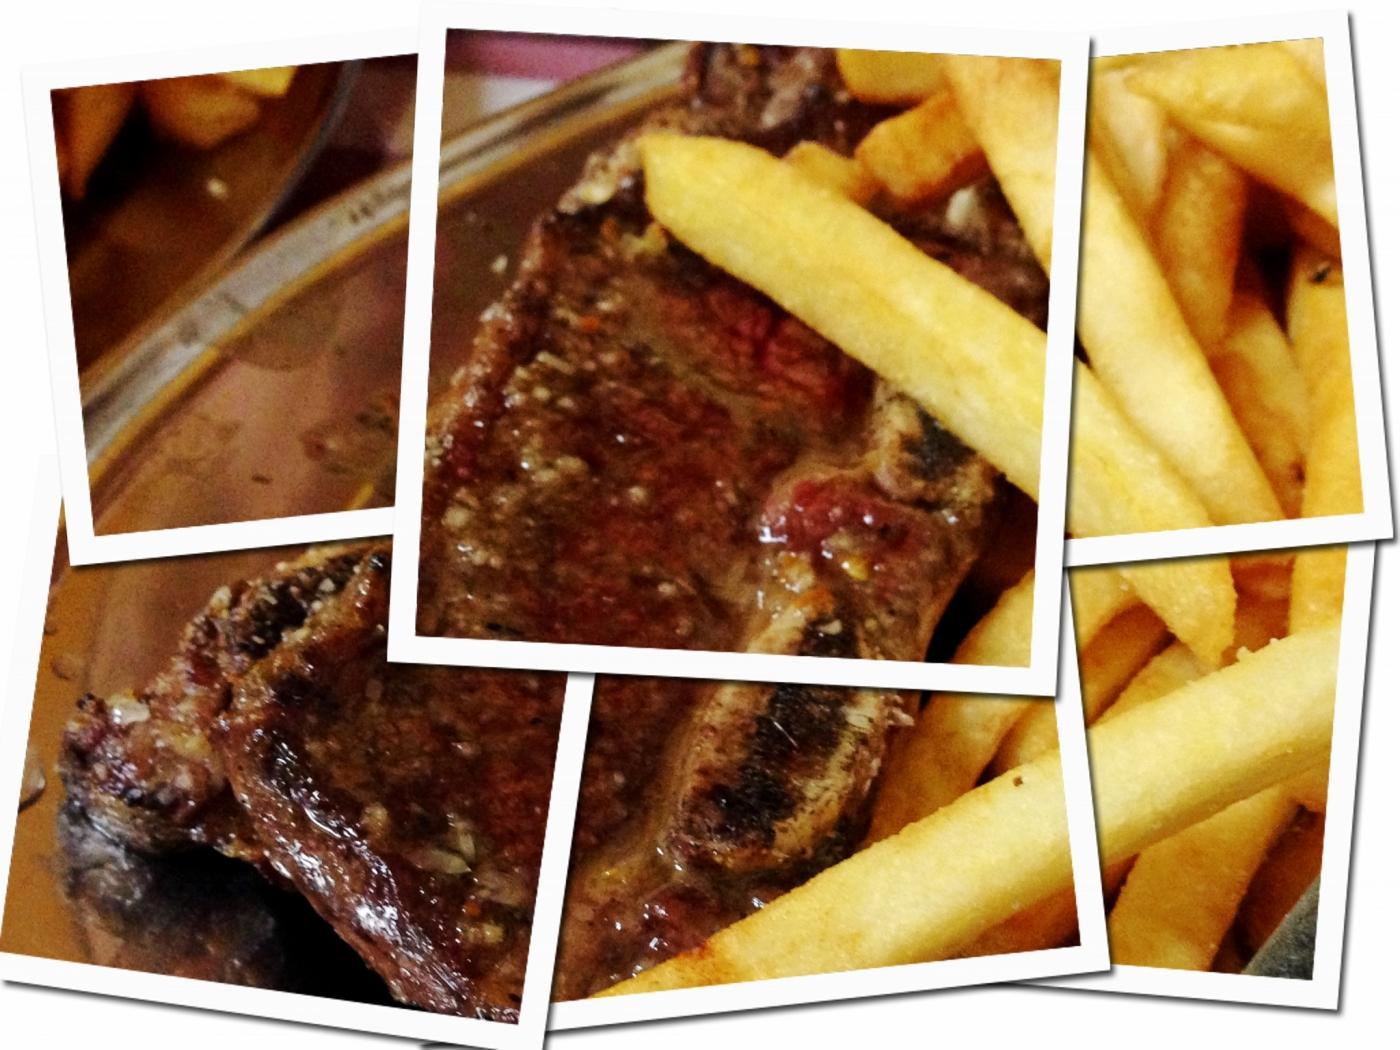 Newark机场附近 大口的吃肉吧!_图1-1